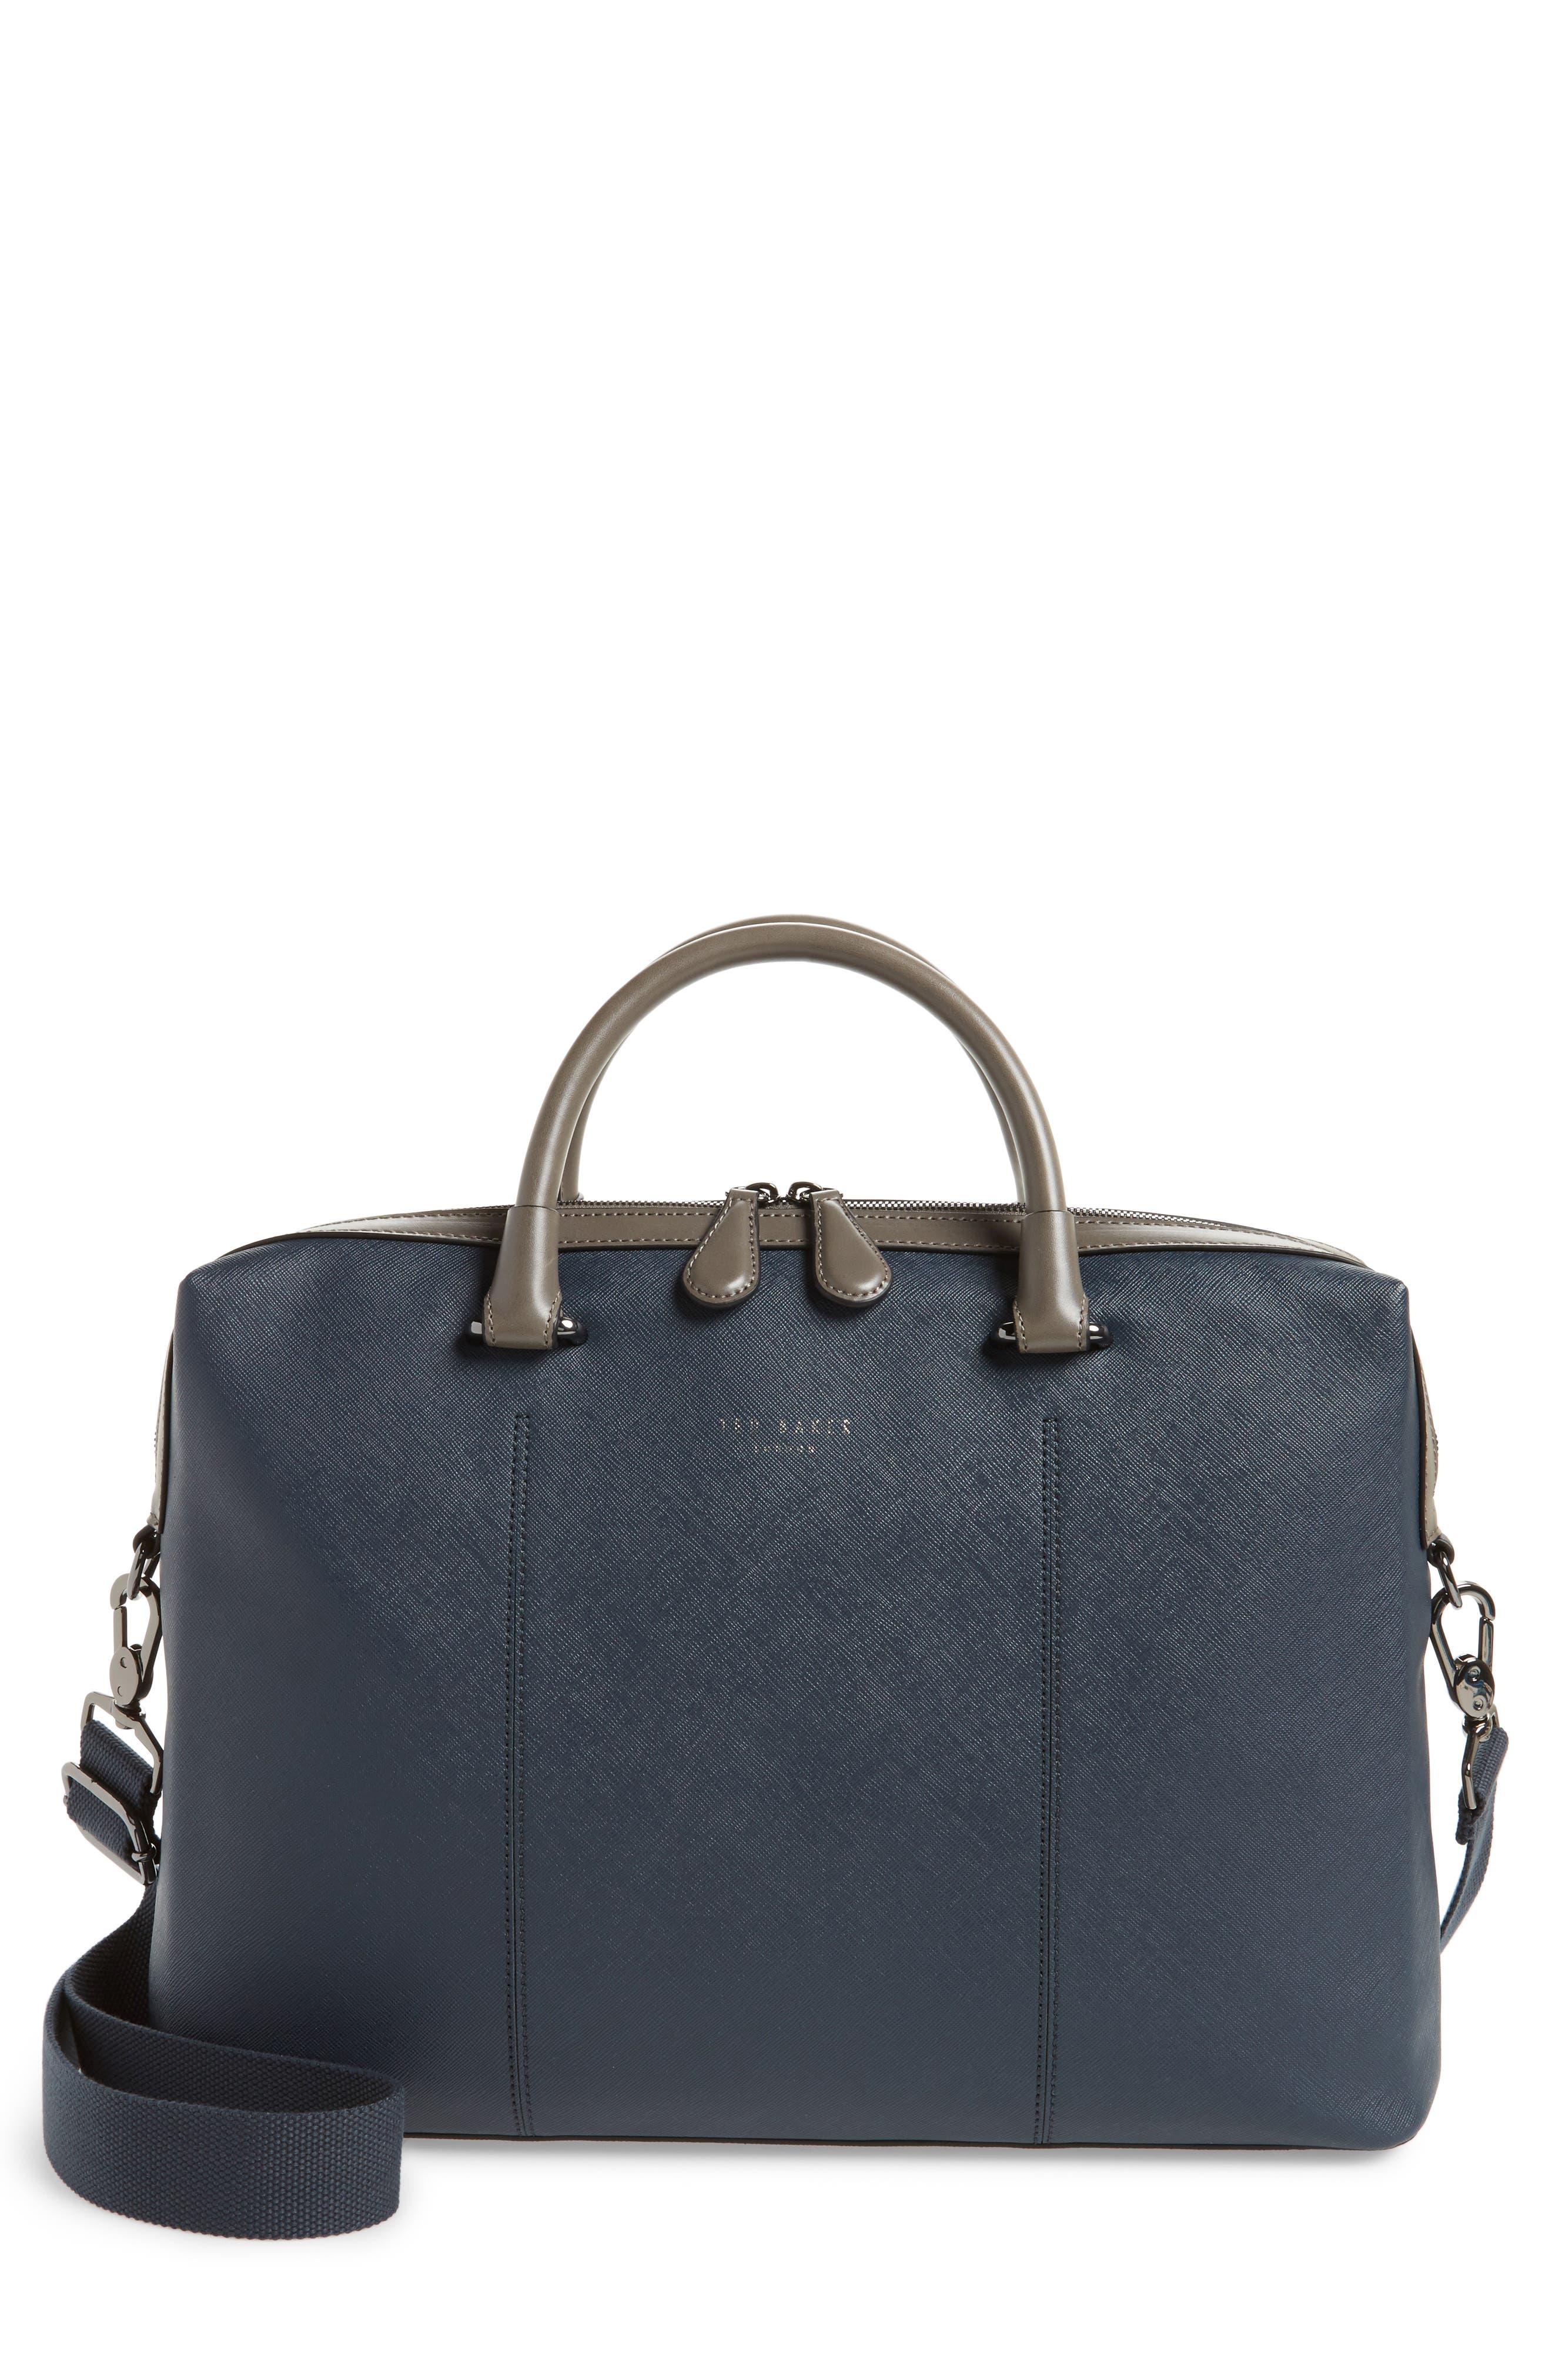 Adult briefcase file